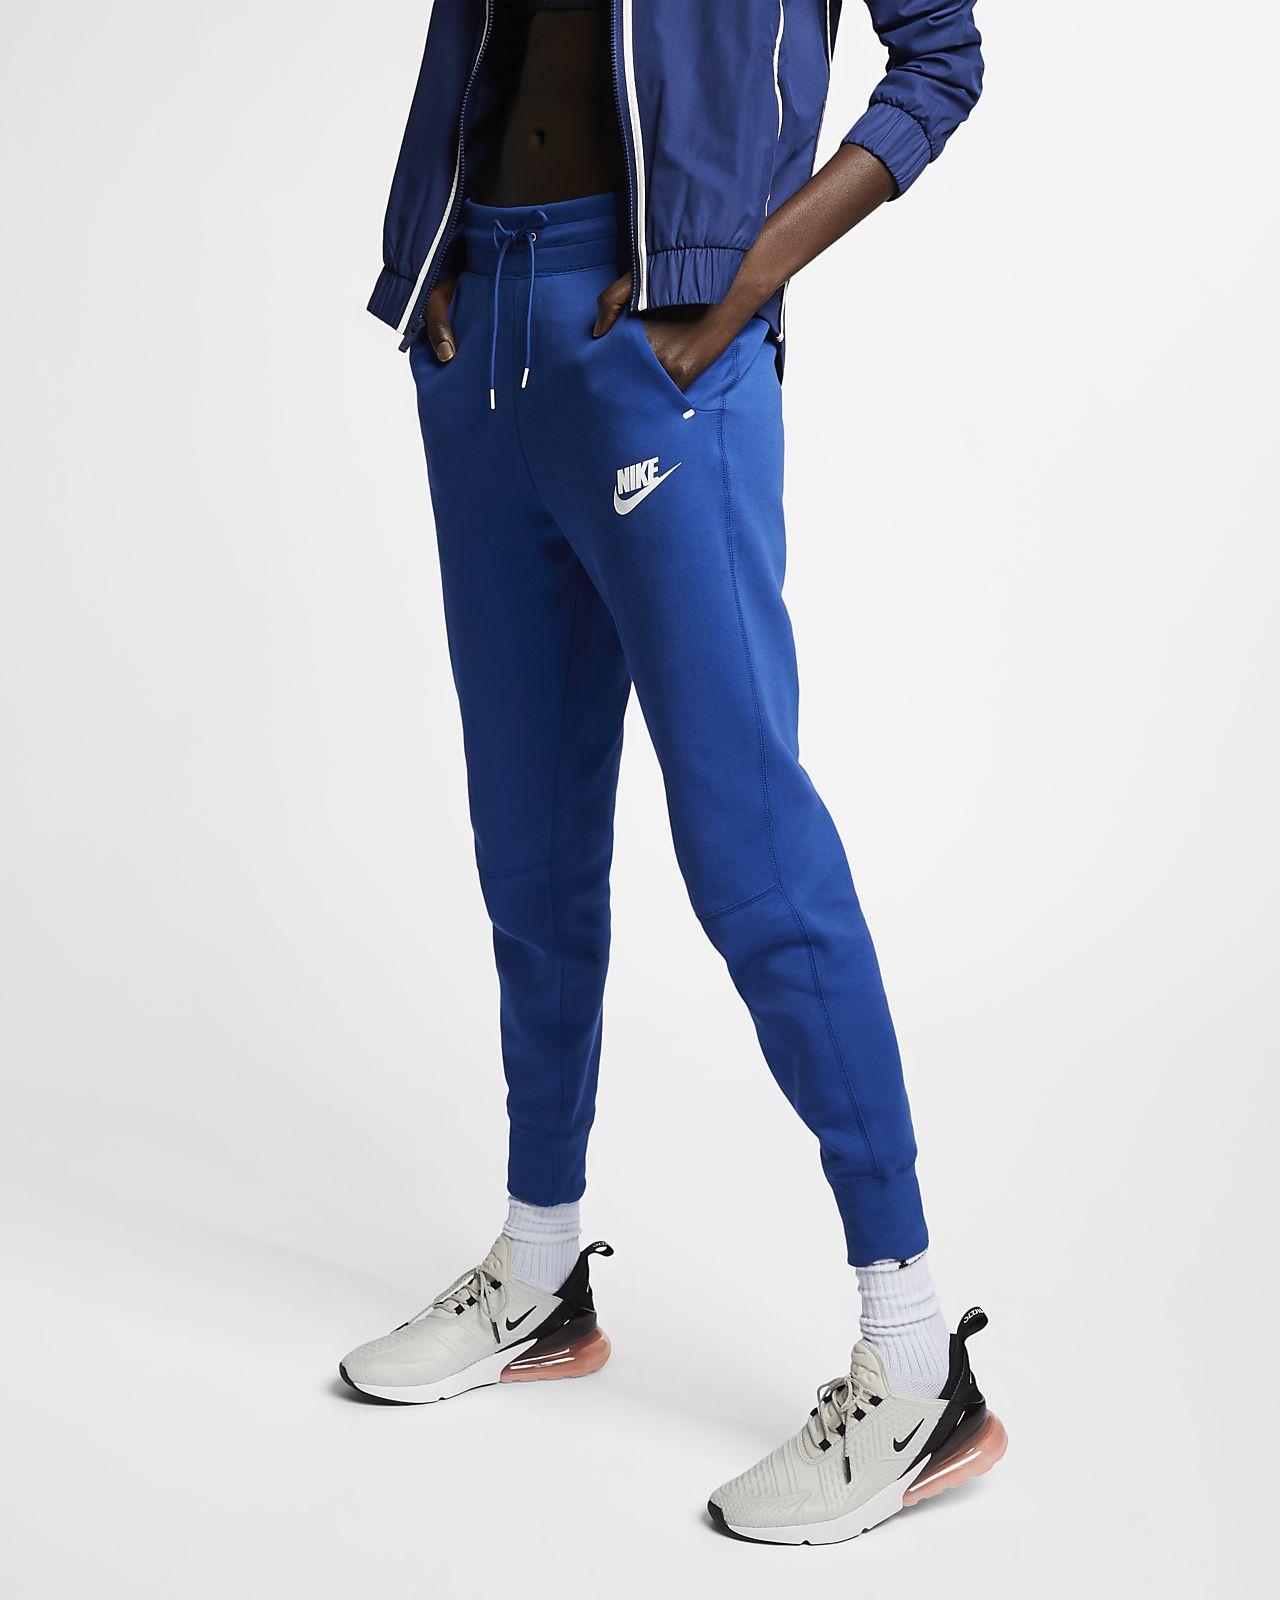 1303e619c61a8 Pantalones para mujer Nike Sportswear Tech Fleece. Nike.com MX